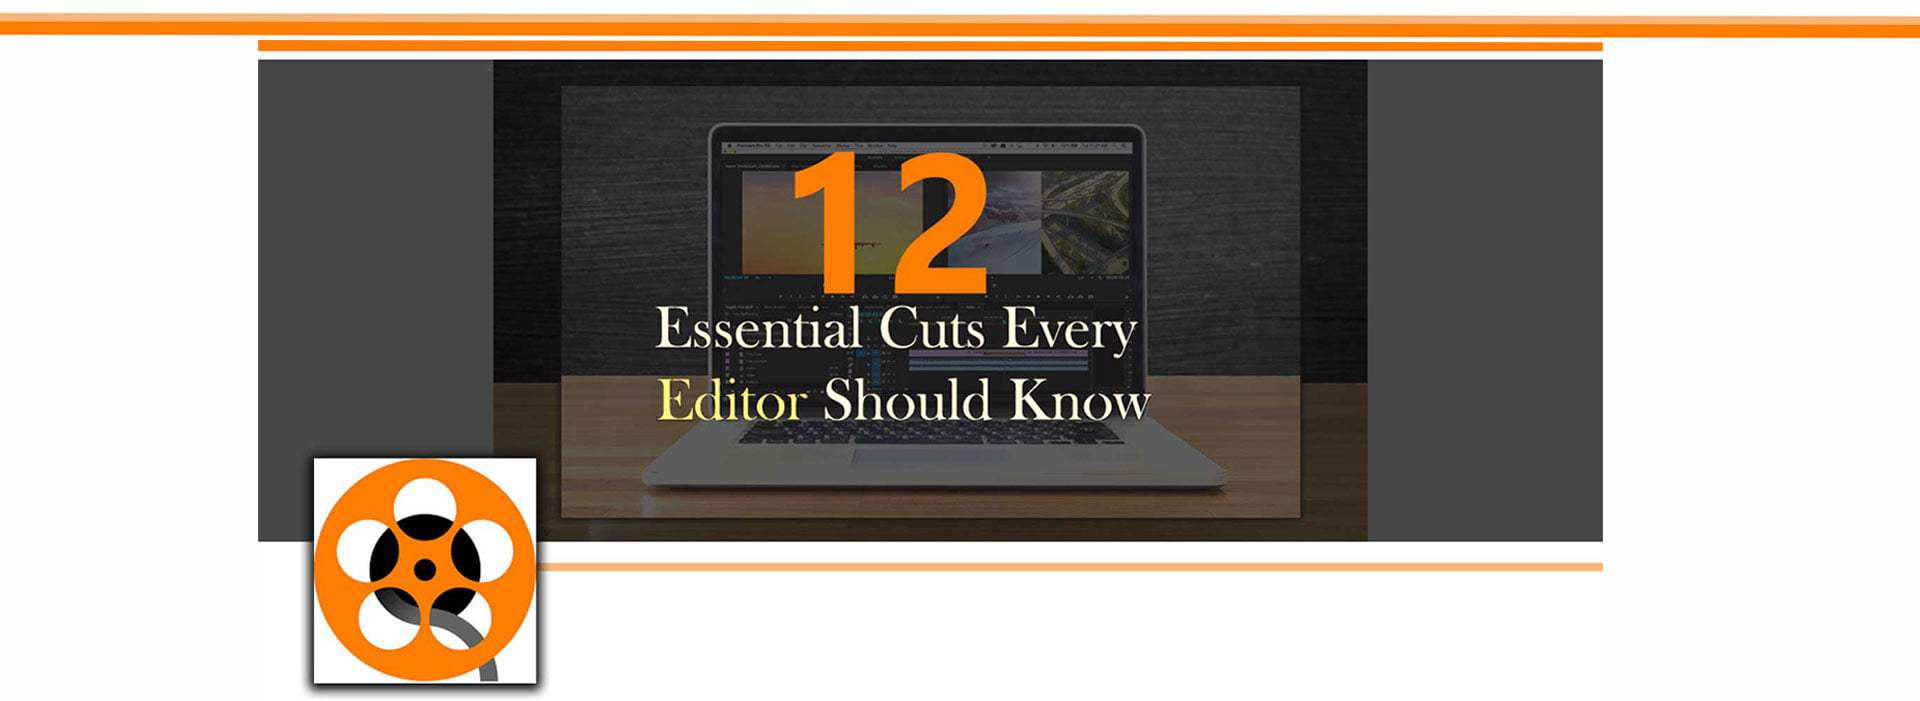 Cuts Every Editor  11 1 - انواع برش در تدوین : 12 کات (برش) ضروری که هر تدوینگر باید بداند